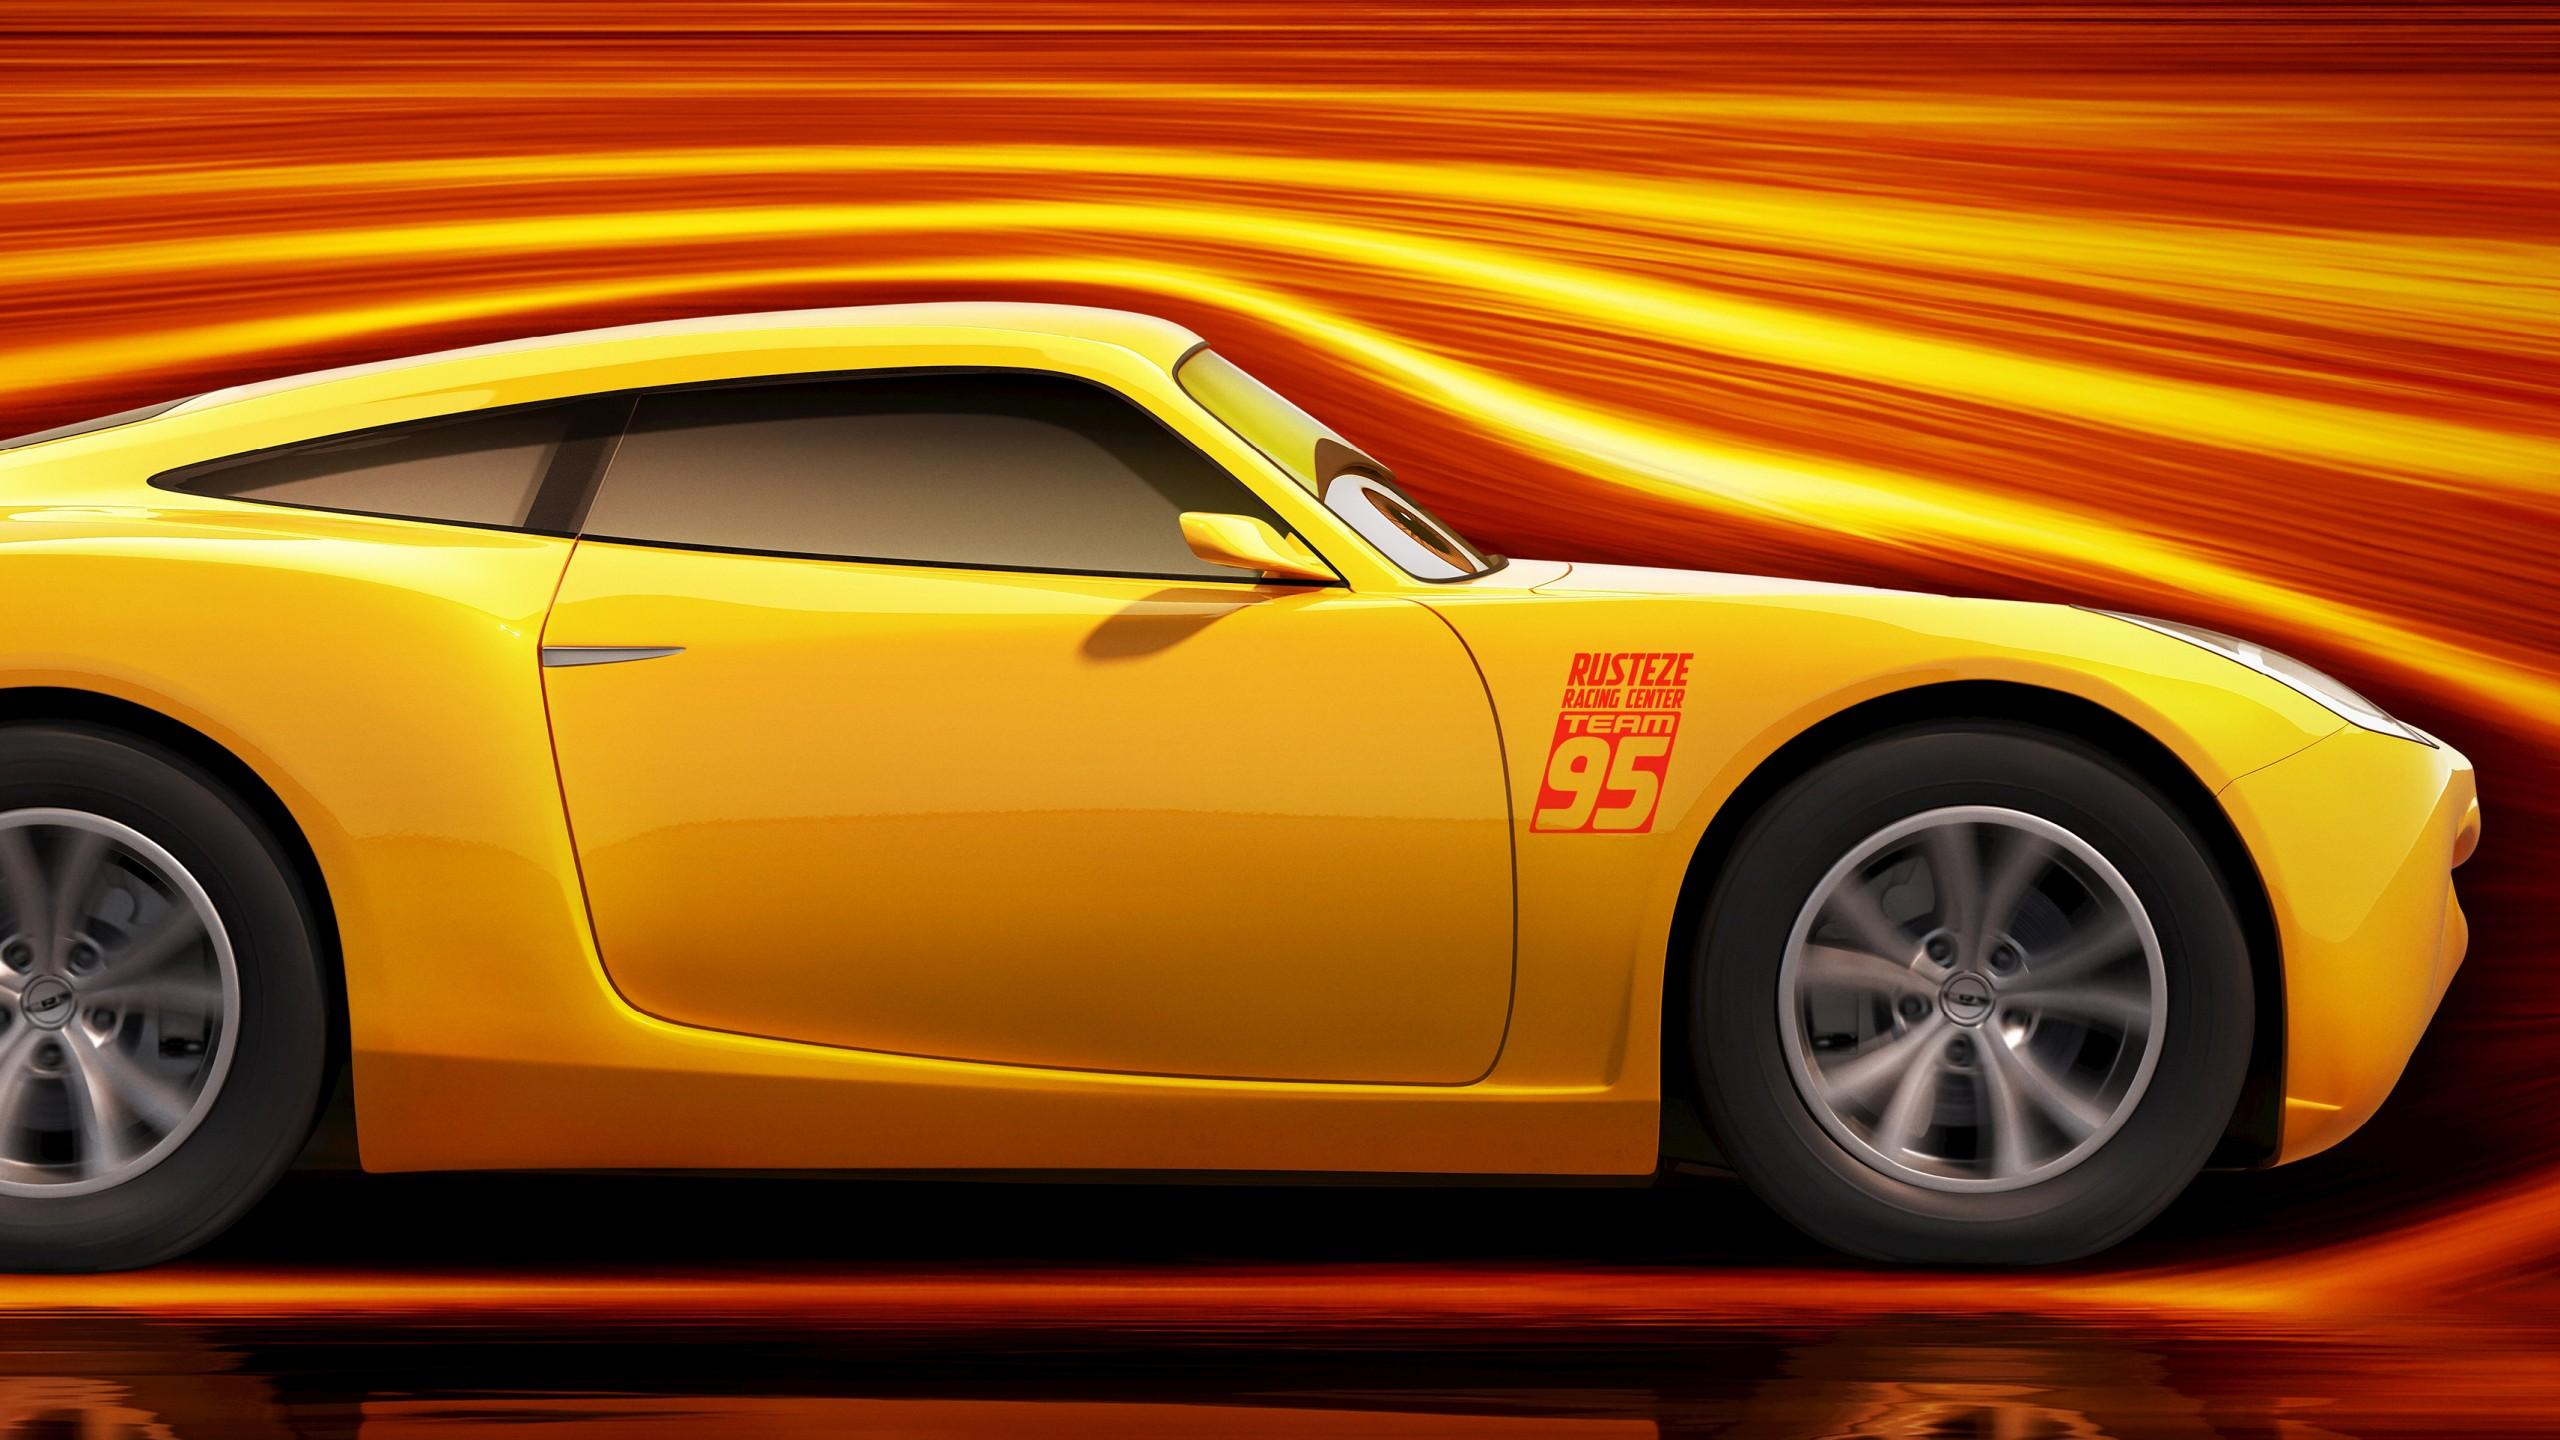 Cars 3 Cruz Ramirez Wallpapers HD Wallpapers ID 19961